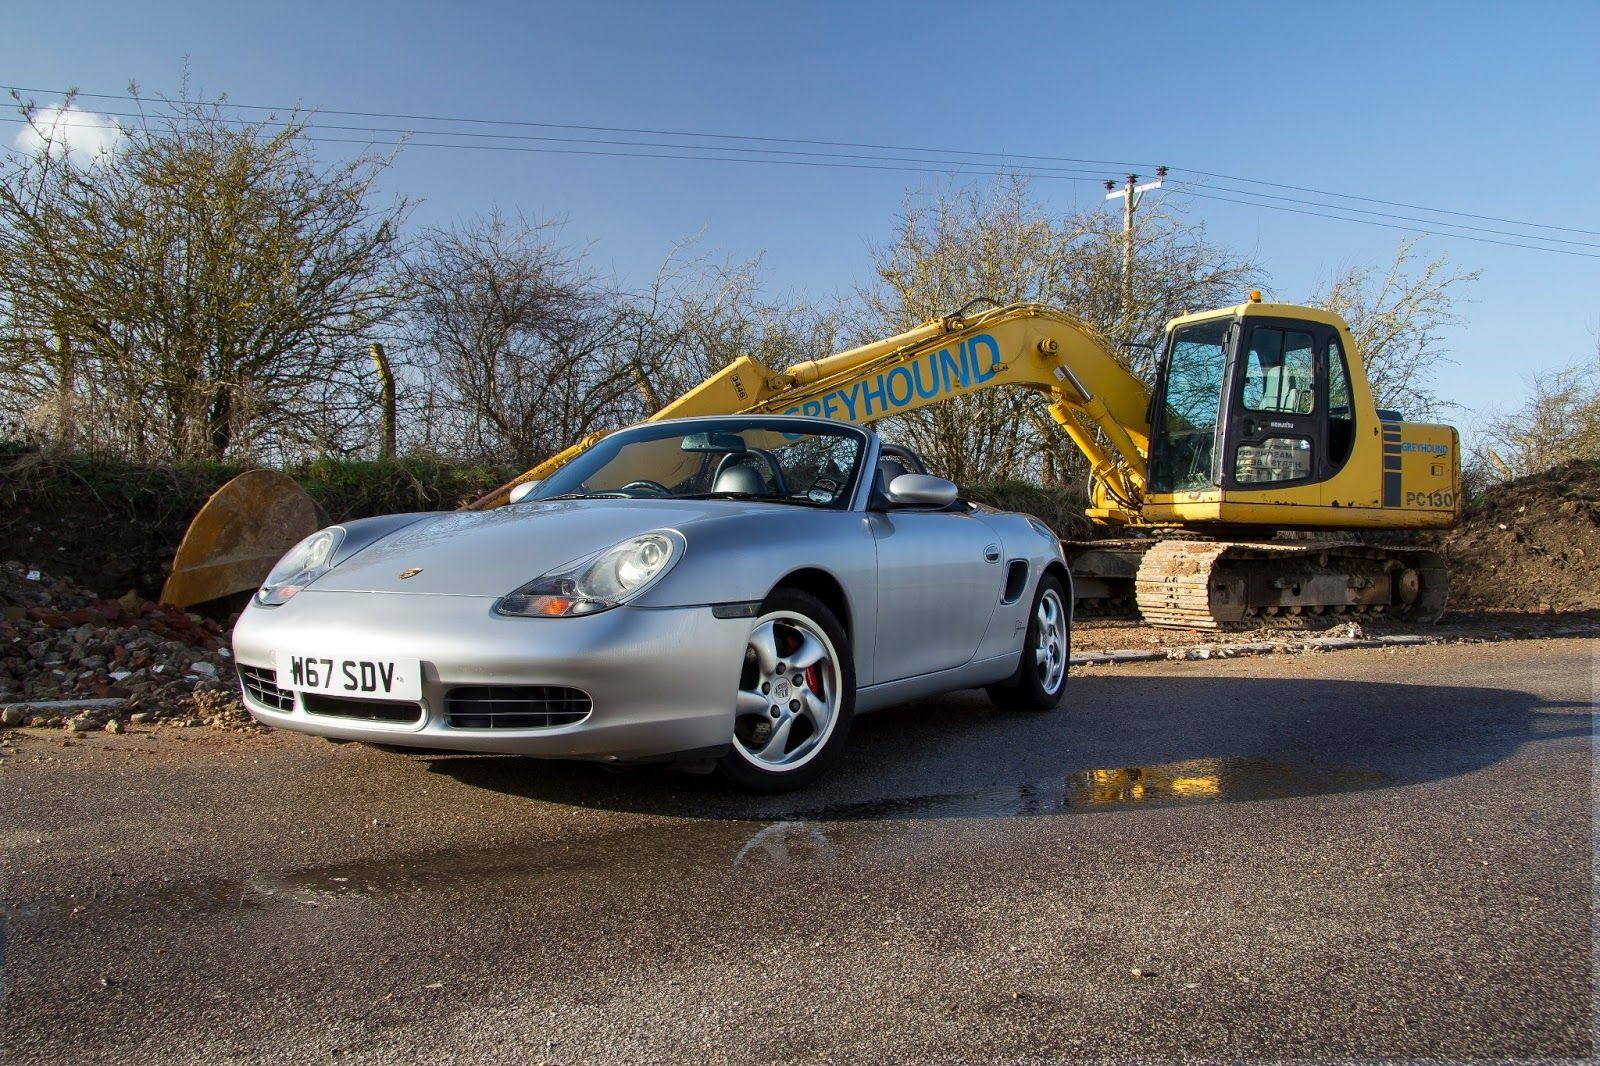 Porsche Boxster S (photo by John Rampton from VROOMPHOTO)